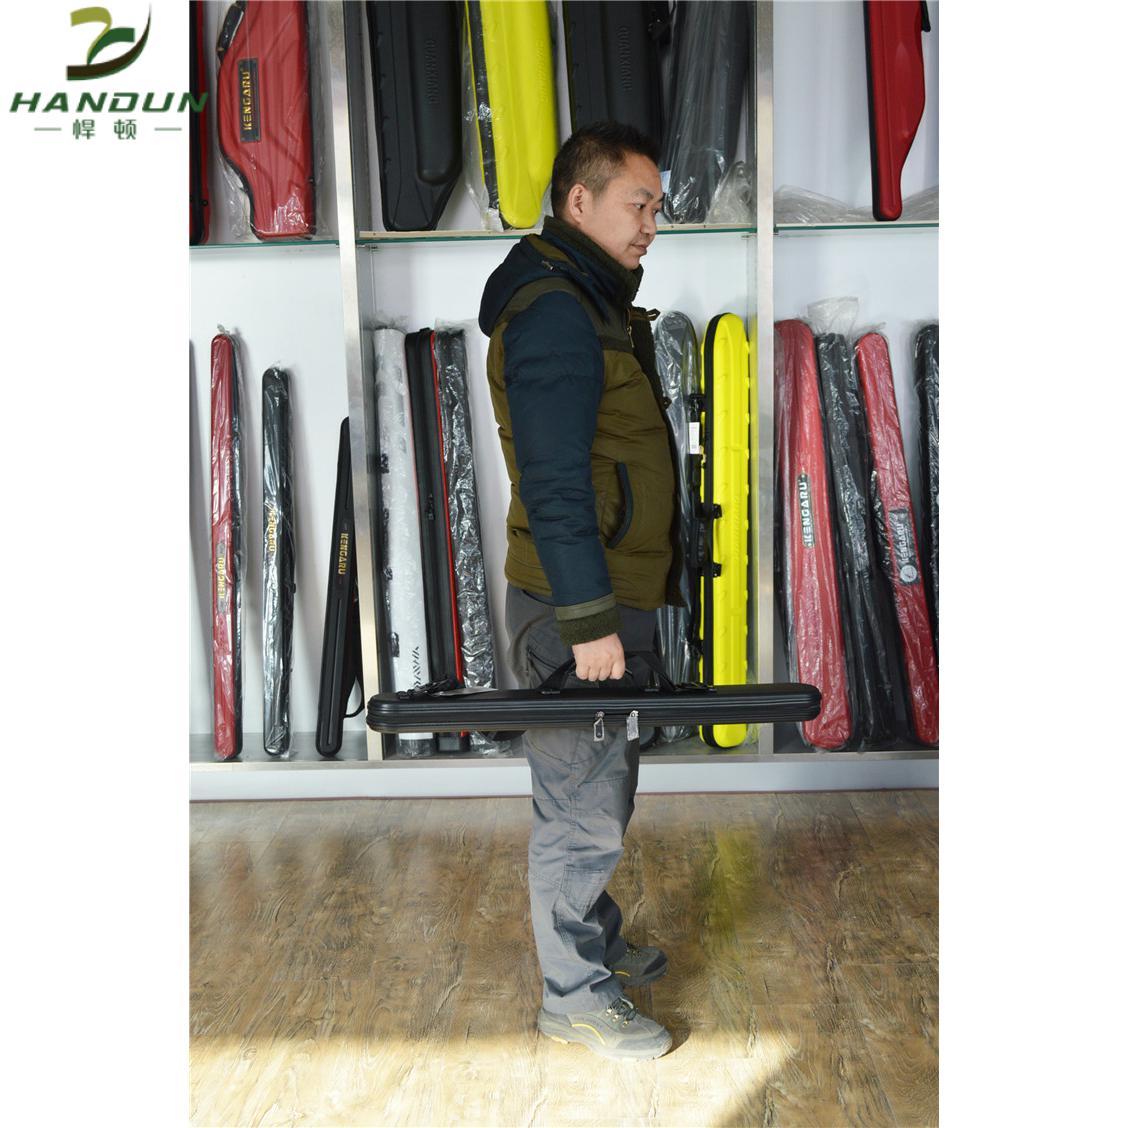 Kengru Hard Case Pole Bag Rod Bag Lure Fishing Rod Bag Extra Long Fishing Bag enlarge